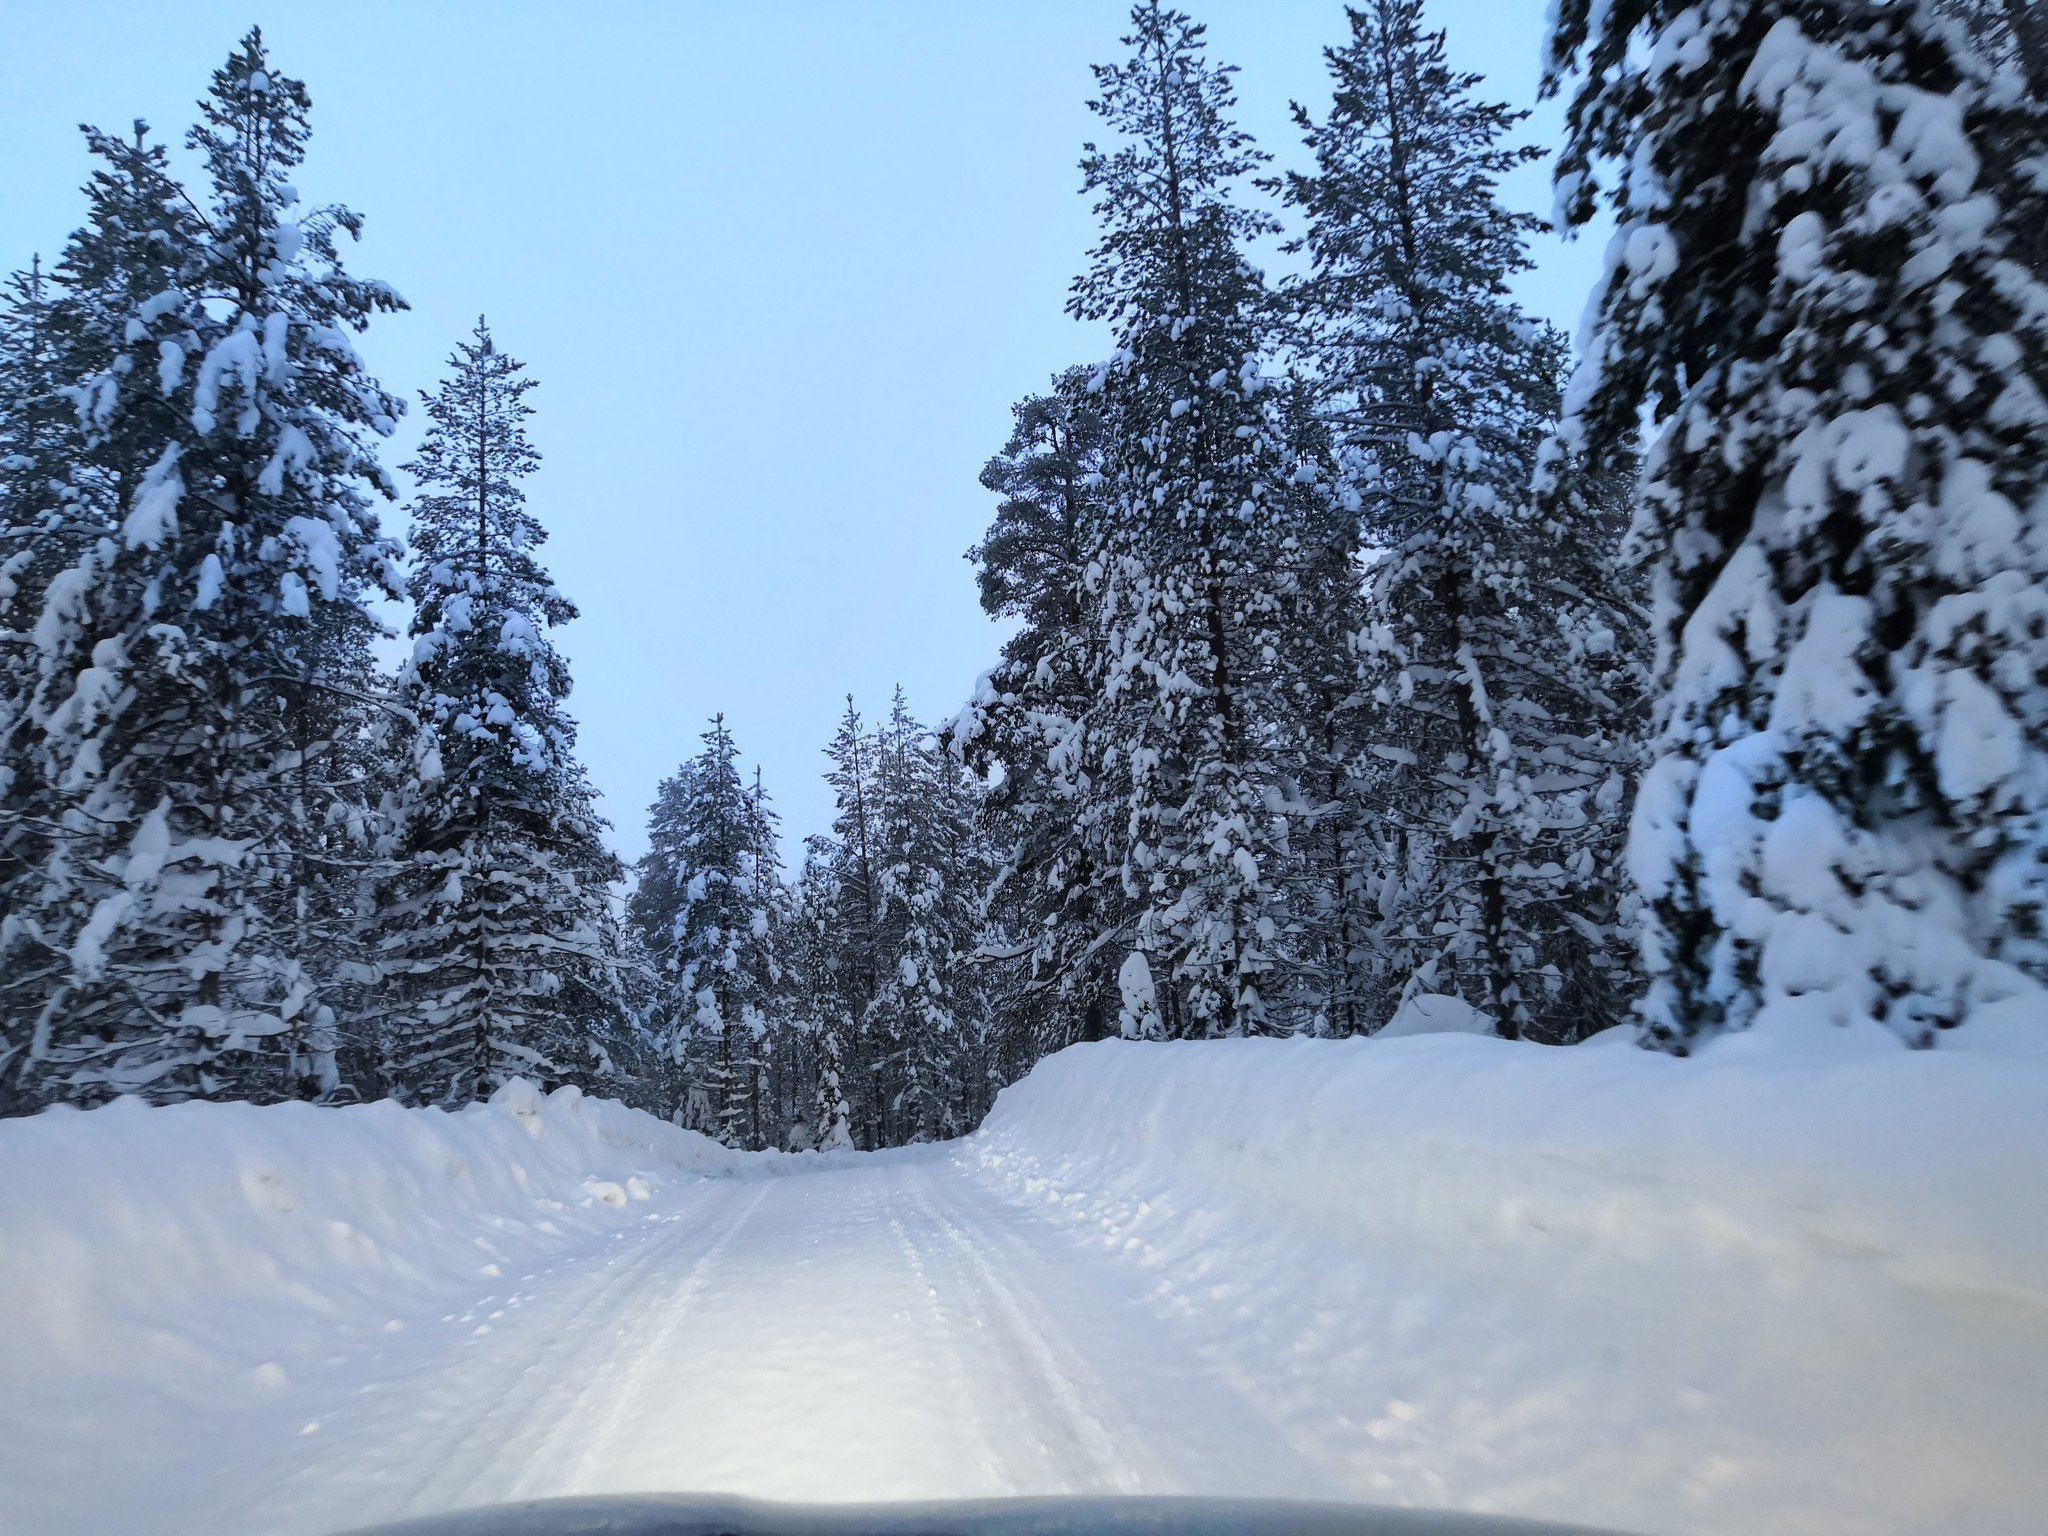 WRC: Arctic Rally Finland - Powered by CapitalBox [26-28 Febrero] - Página 3 EvJR-7kXAAETc0w?format=jpg&name=large